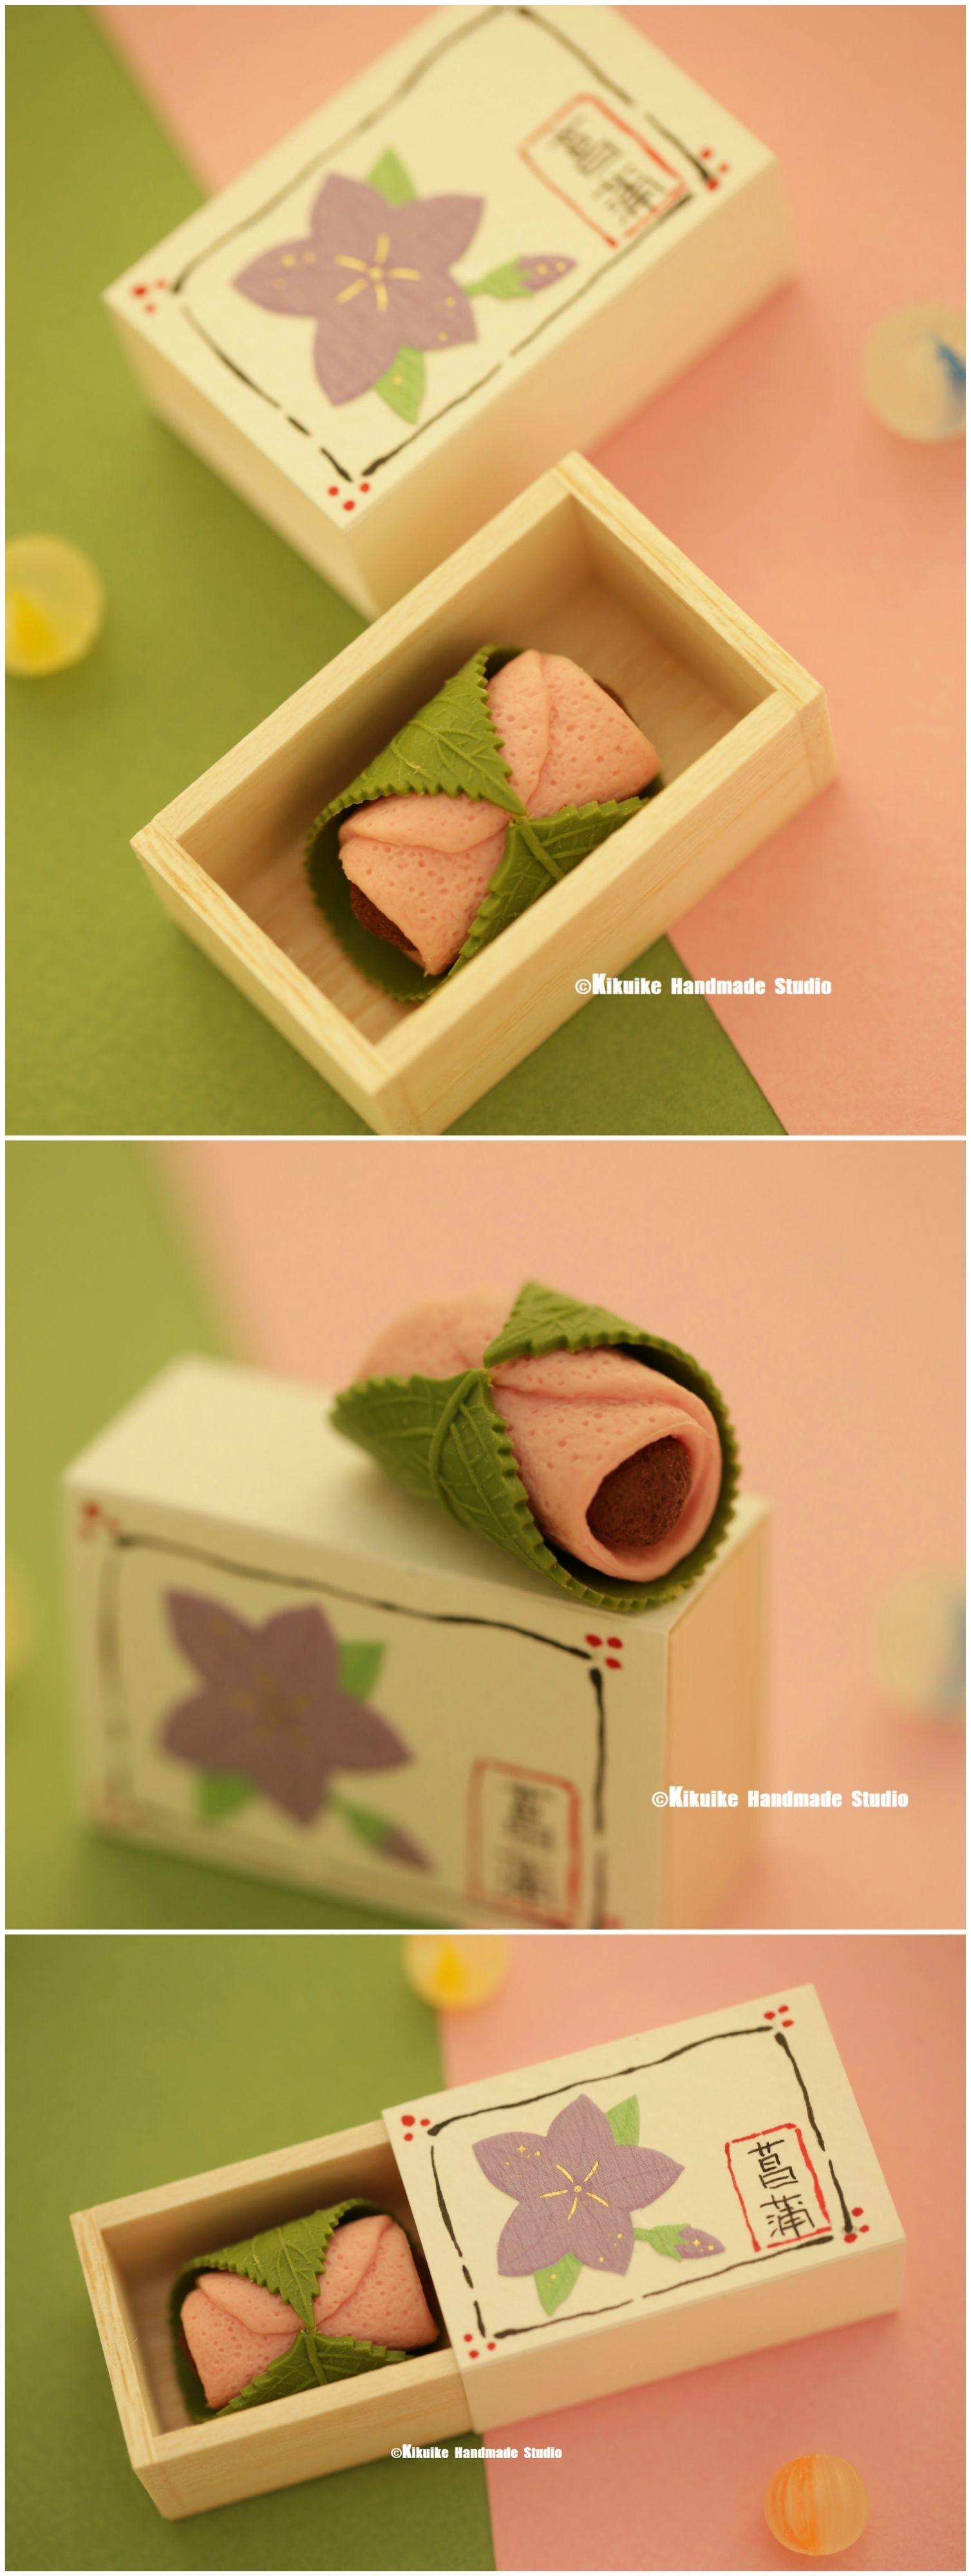 Japanese Miniatures Food (Wagashi ) Matchbox,Matchbox,Gift Box,Matchbox